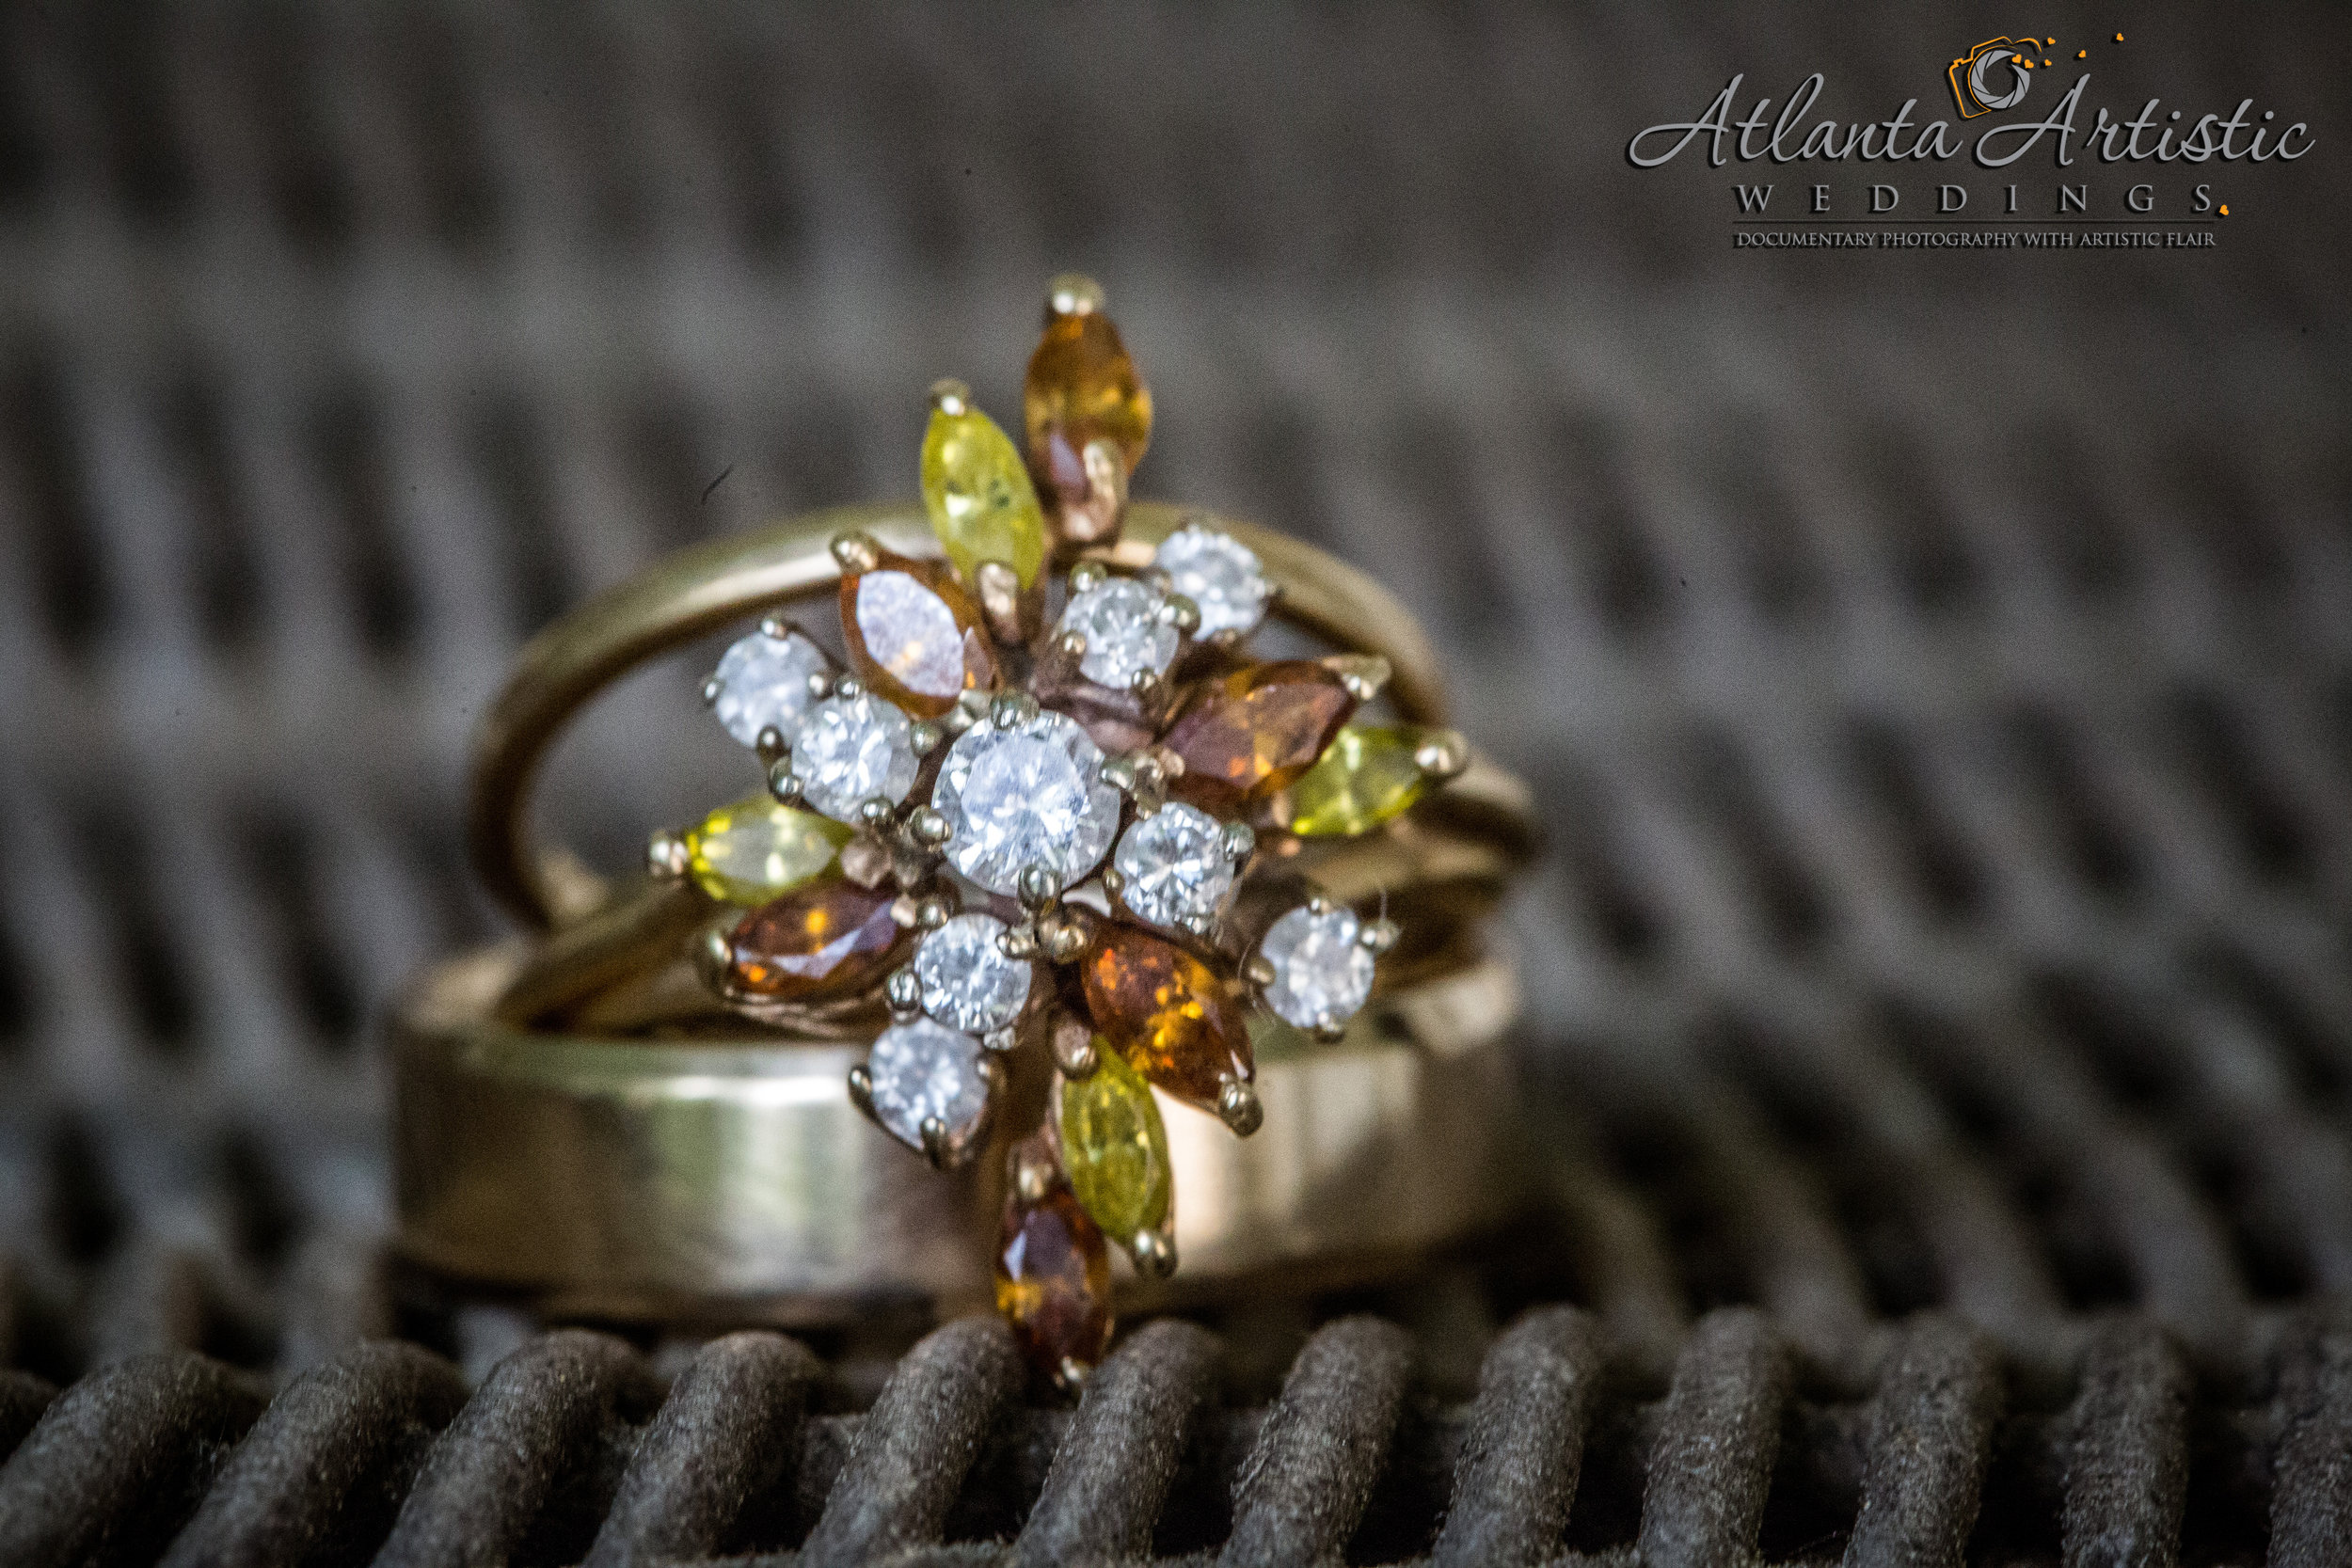 Atlanta Wedding Photographers Use Whicker Basket to Display Wedding Rings